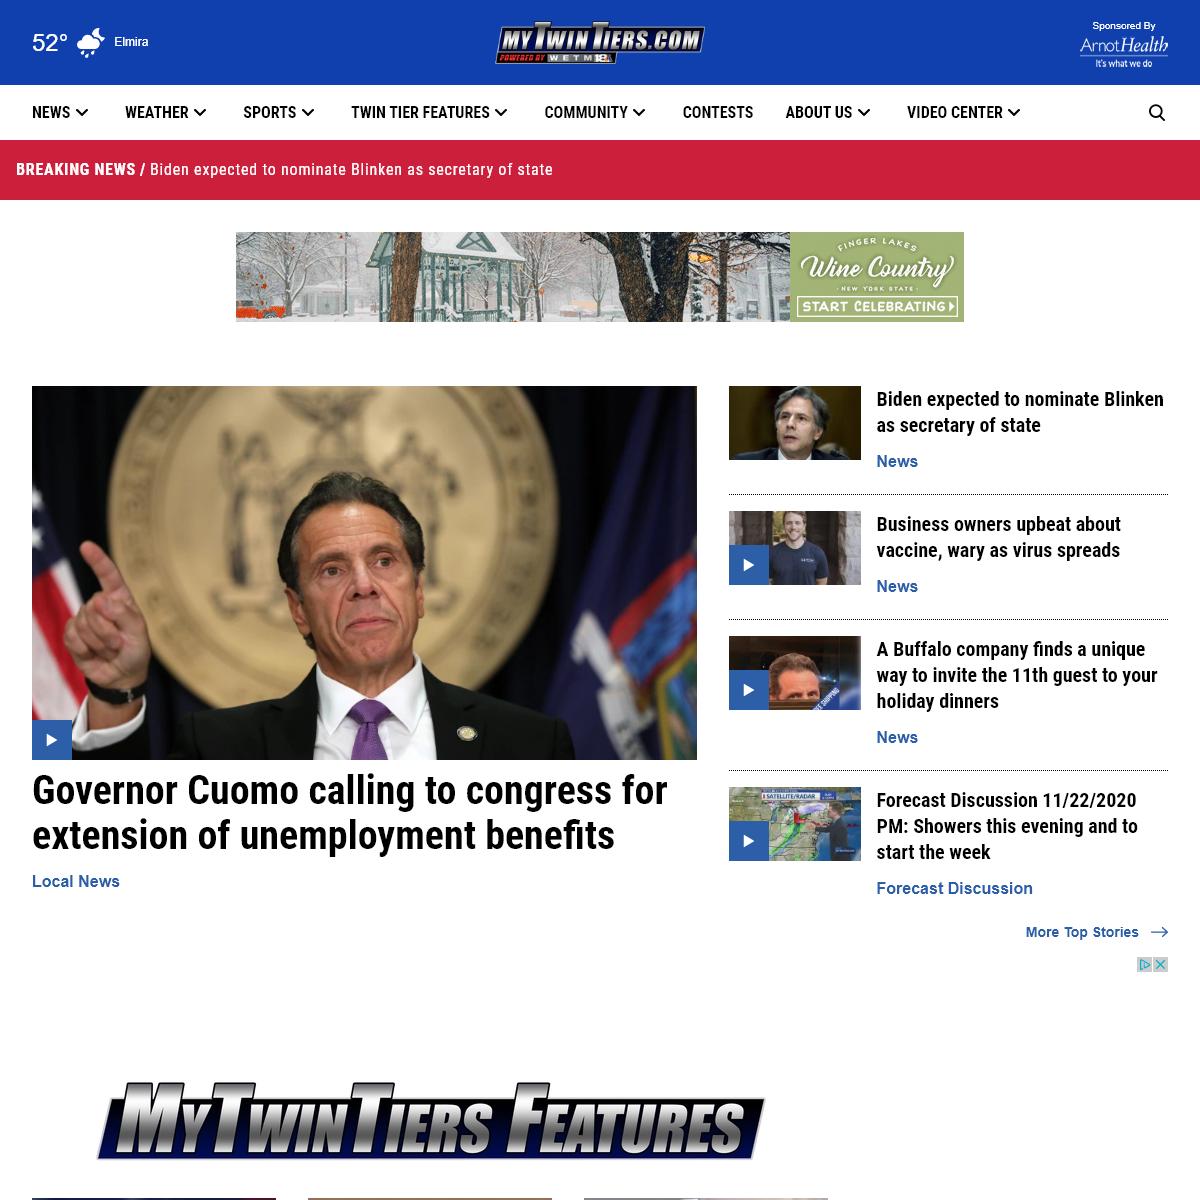 WETM 18 News - Elmira, NY News & Weather - MyTwinTiers.com